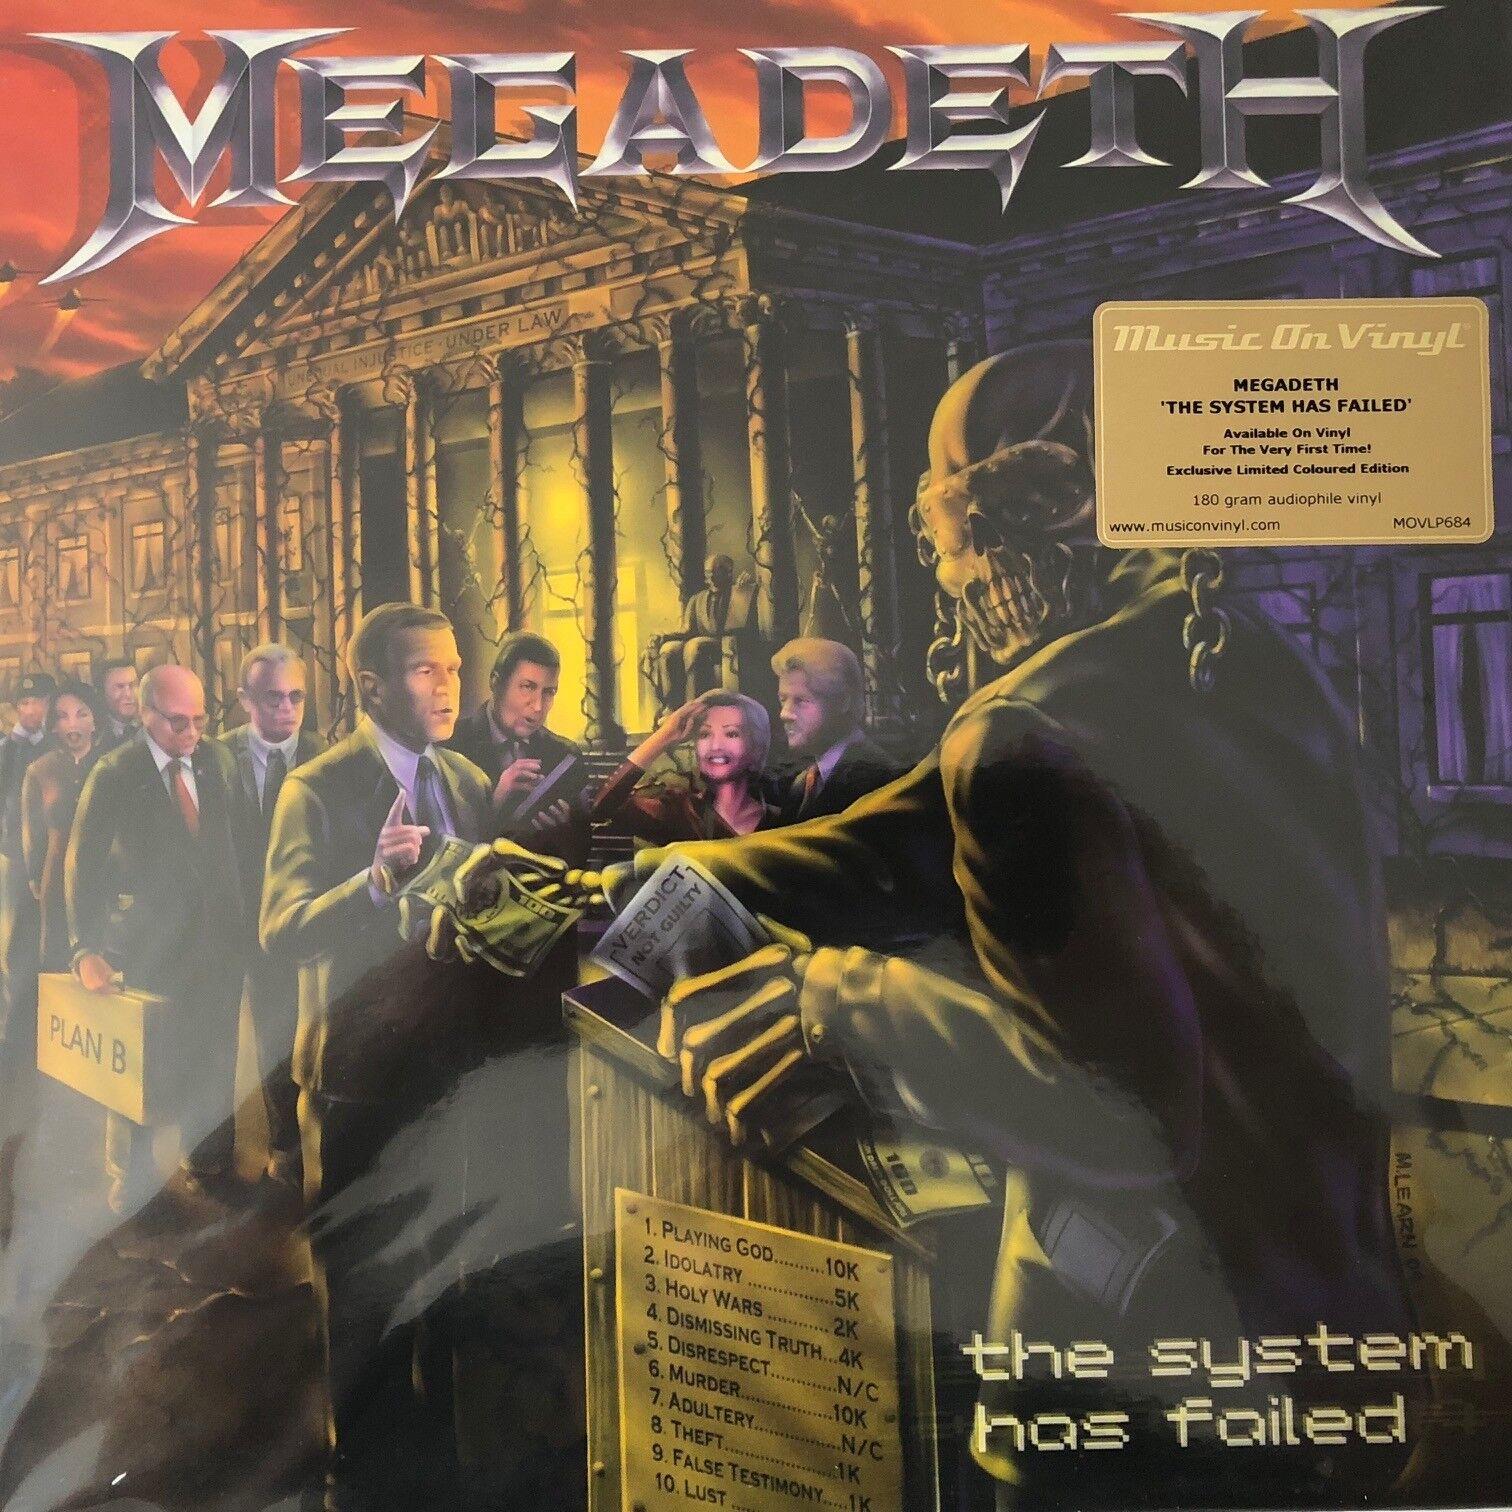 Megadeth the system has failed purple vinyl movlp for sale jpg 1512x1512  The system has failed a35b95bbaedaf